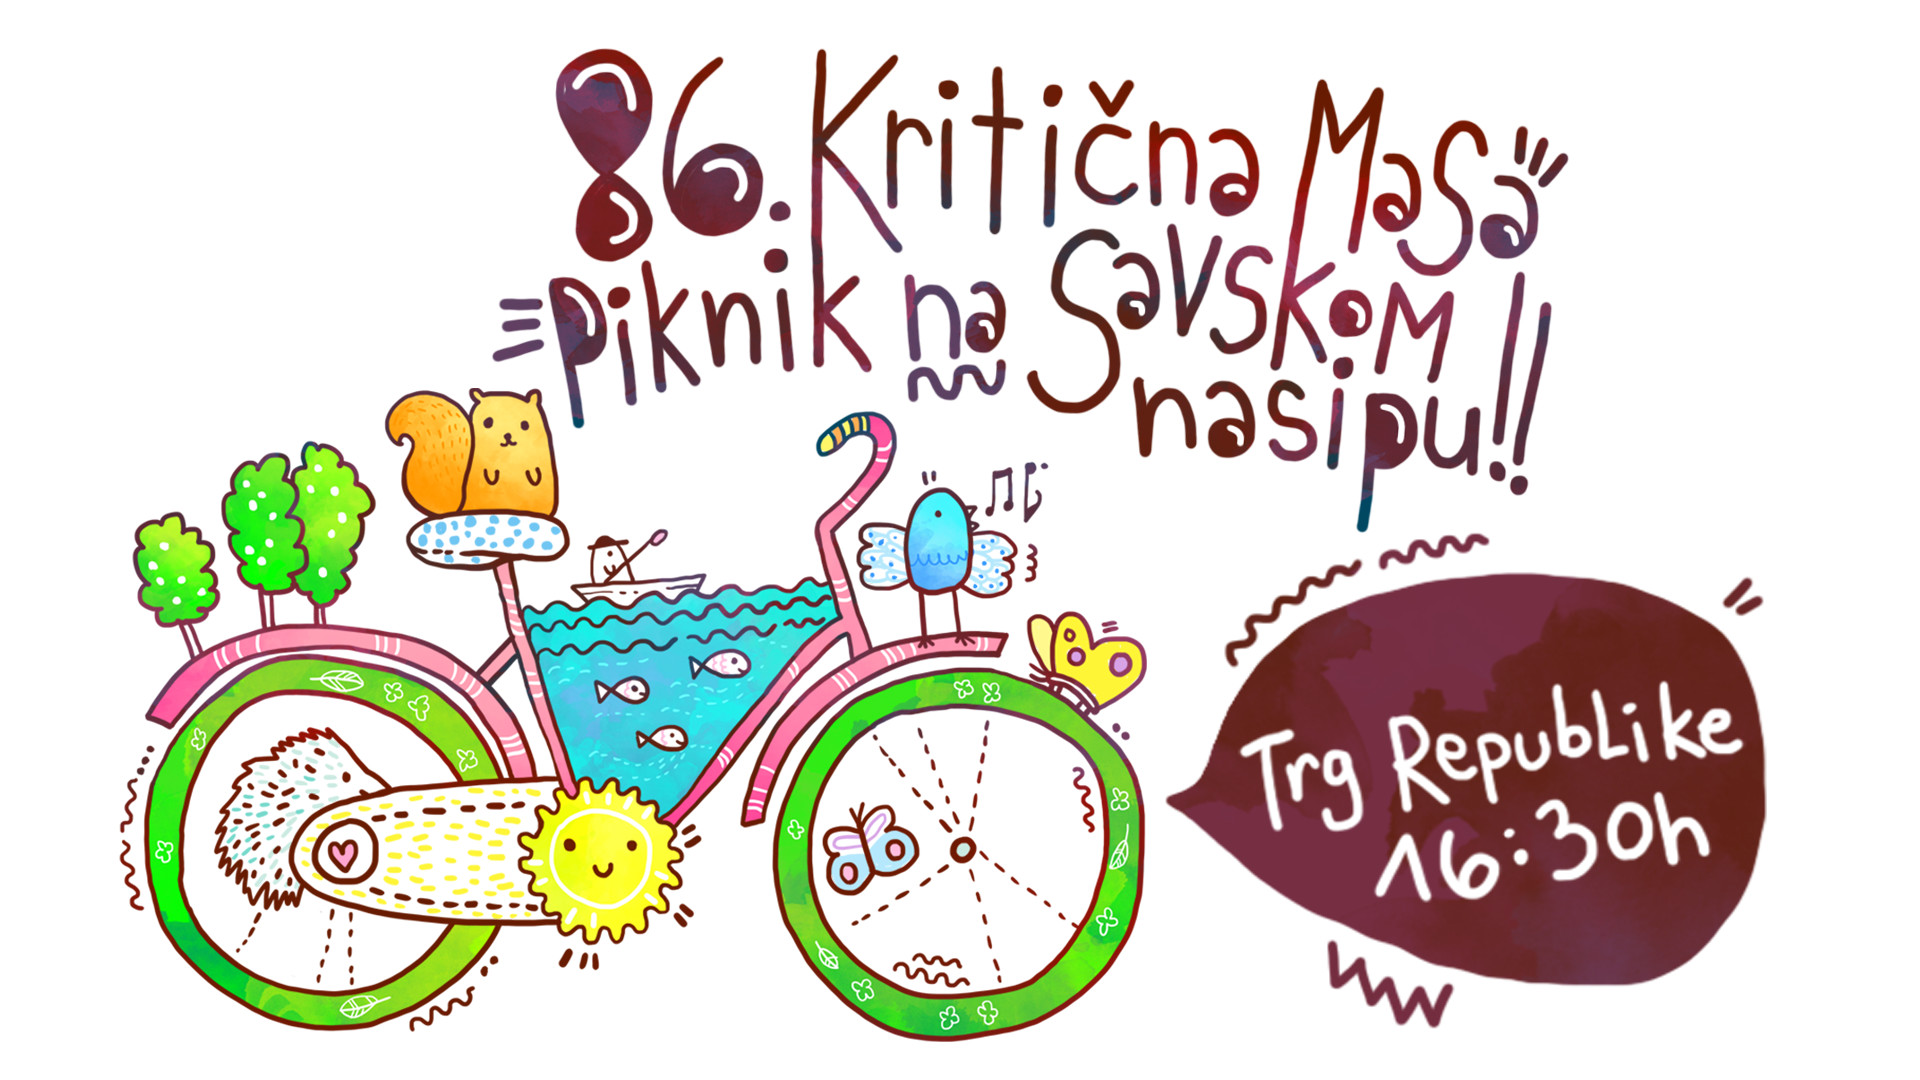 Kritična masa bicikl Beograd coomuting protest